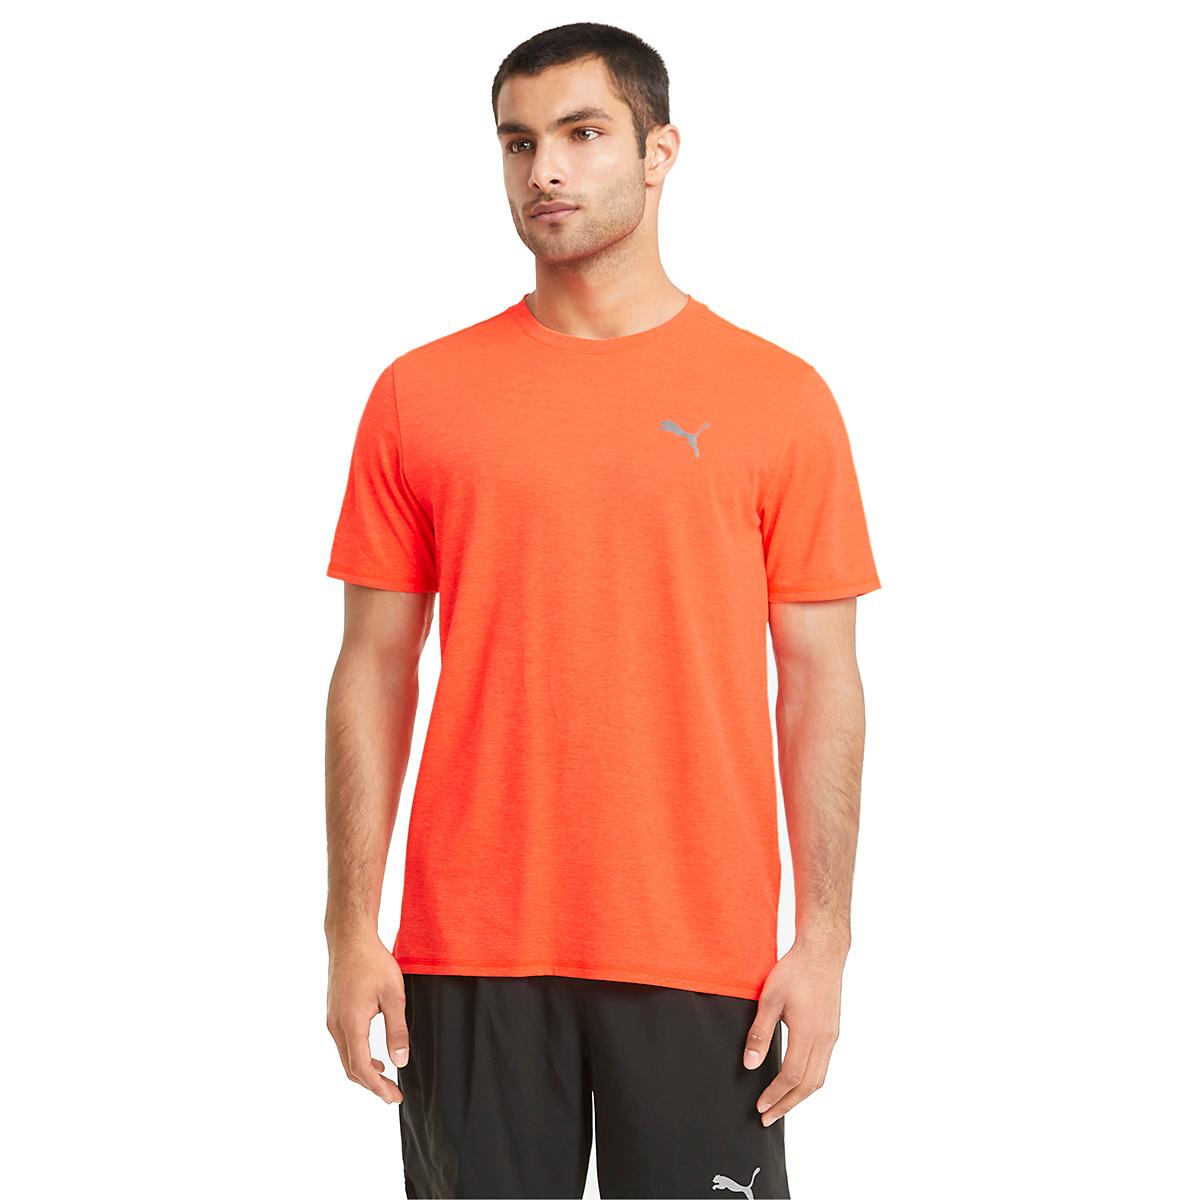 Men's Puma Favorite Heather Short Sleeve Running Tee - Color: Lava Blast - Size: S, Lava Blast, large, image 1